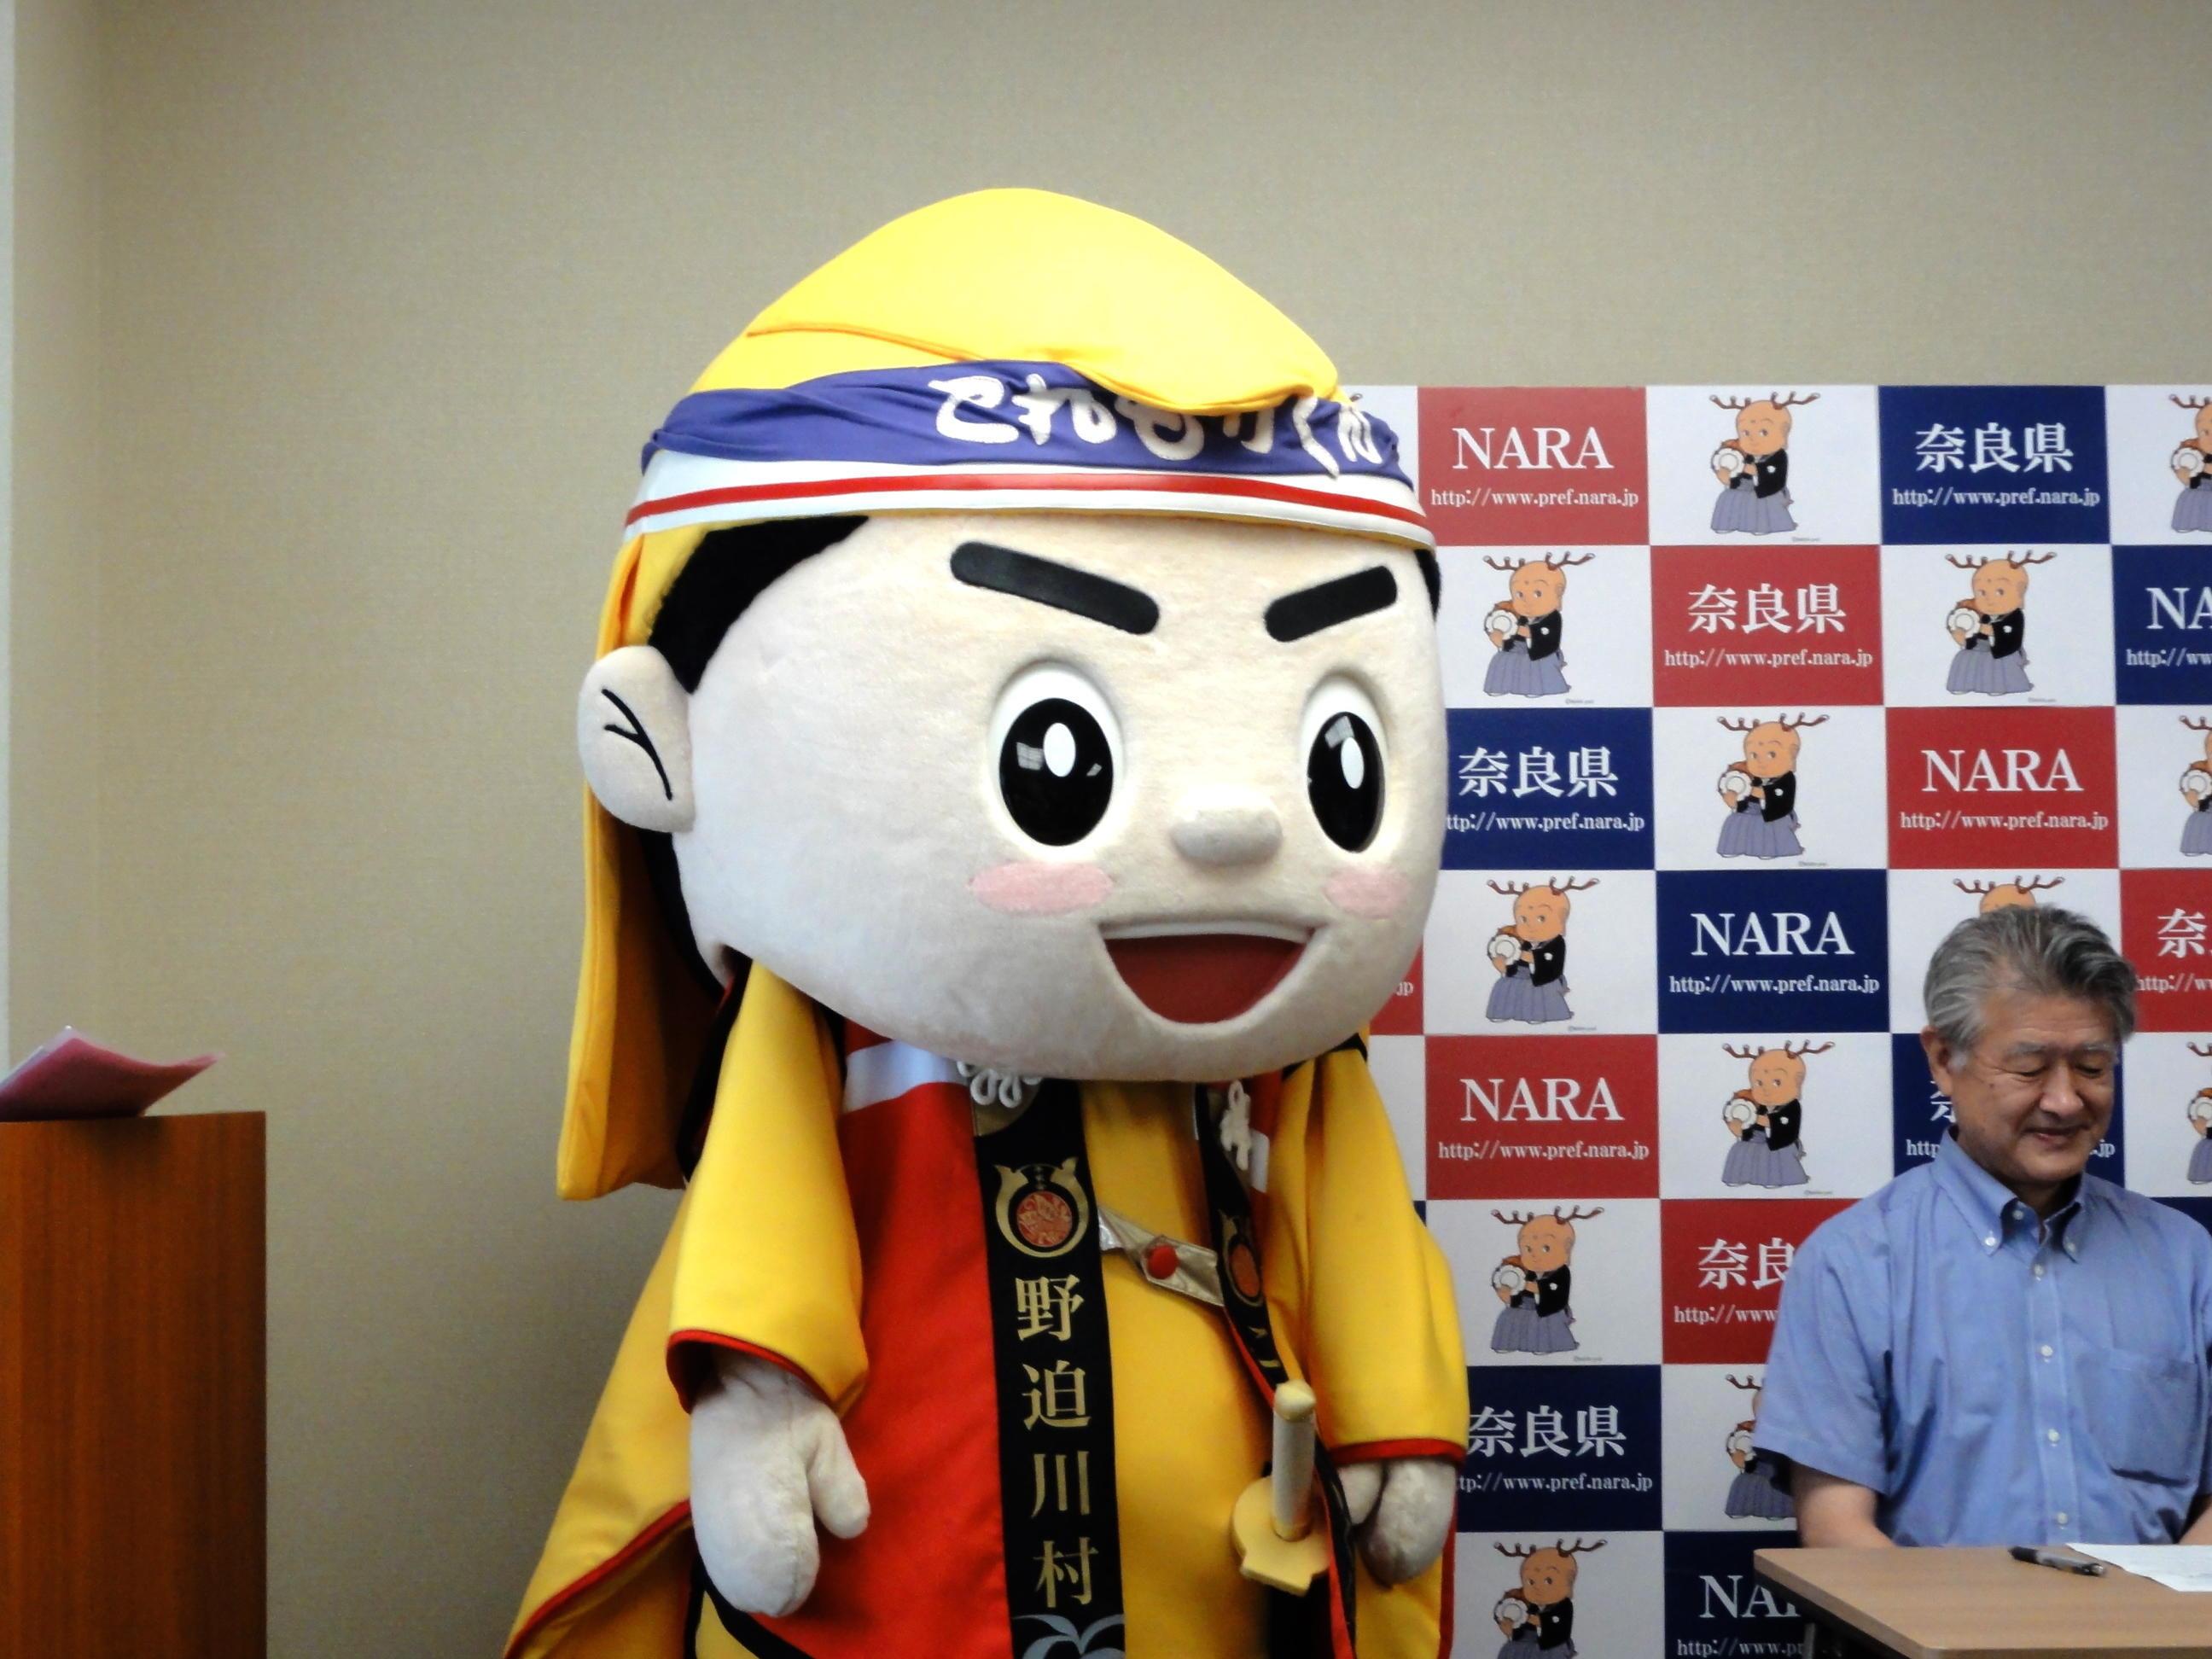 http://news.yoshimoto.co.jp/20170727211810-8ad26dec6a9abb46040aeb7f8a481ee74a23674c.jpg